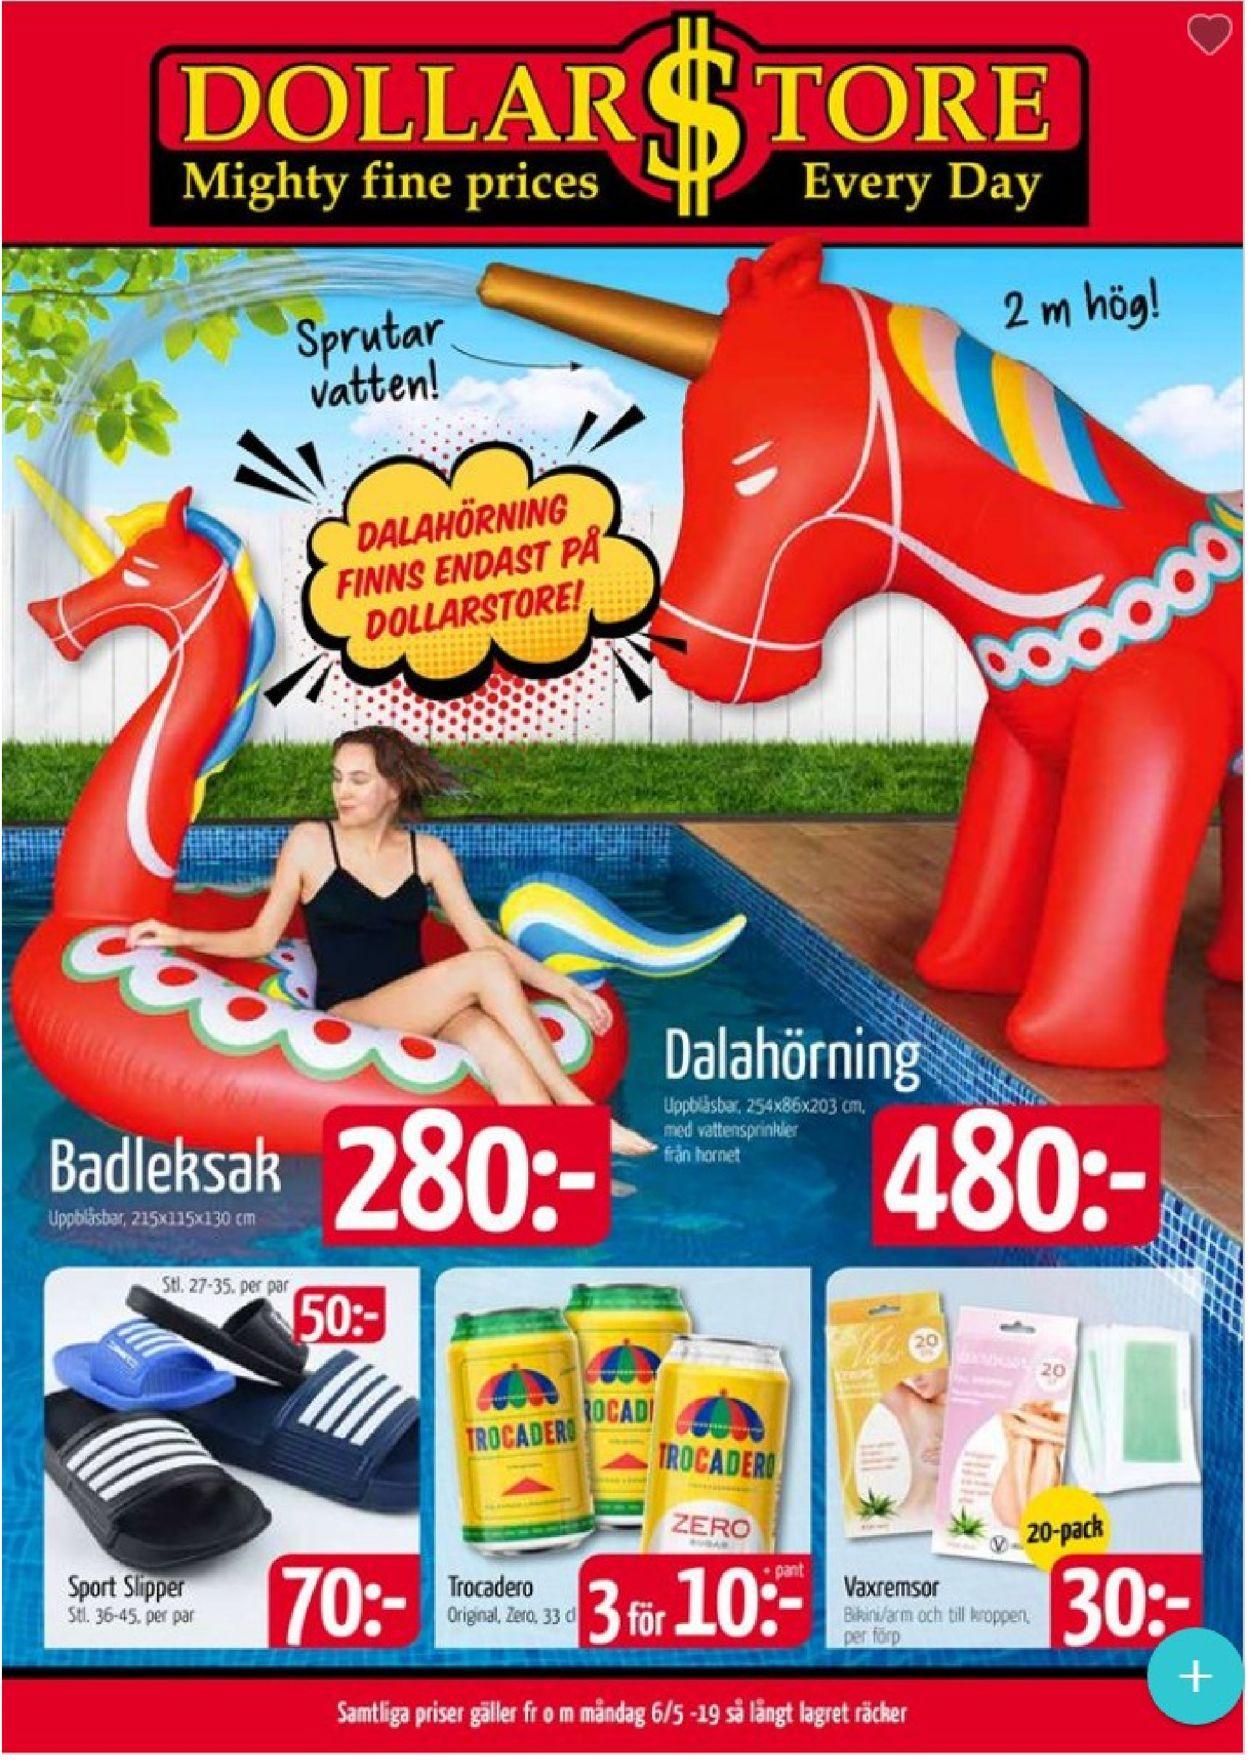 54b9a961f8e9 Dollarstore Aktuell annons 06/05 - 19/05-2019 - veckovis-reklamblad.se